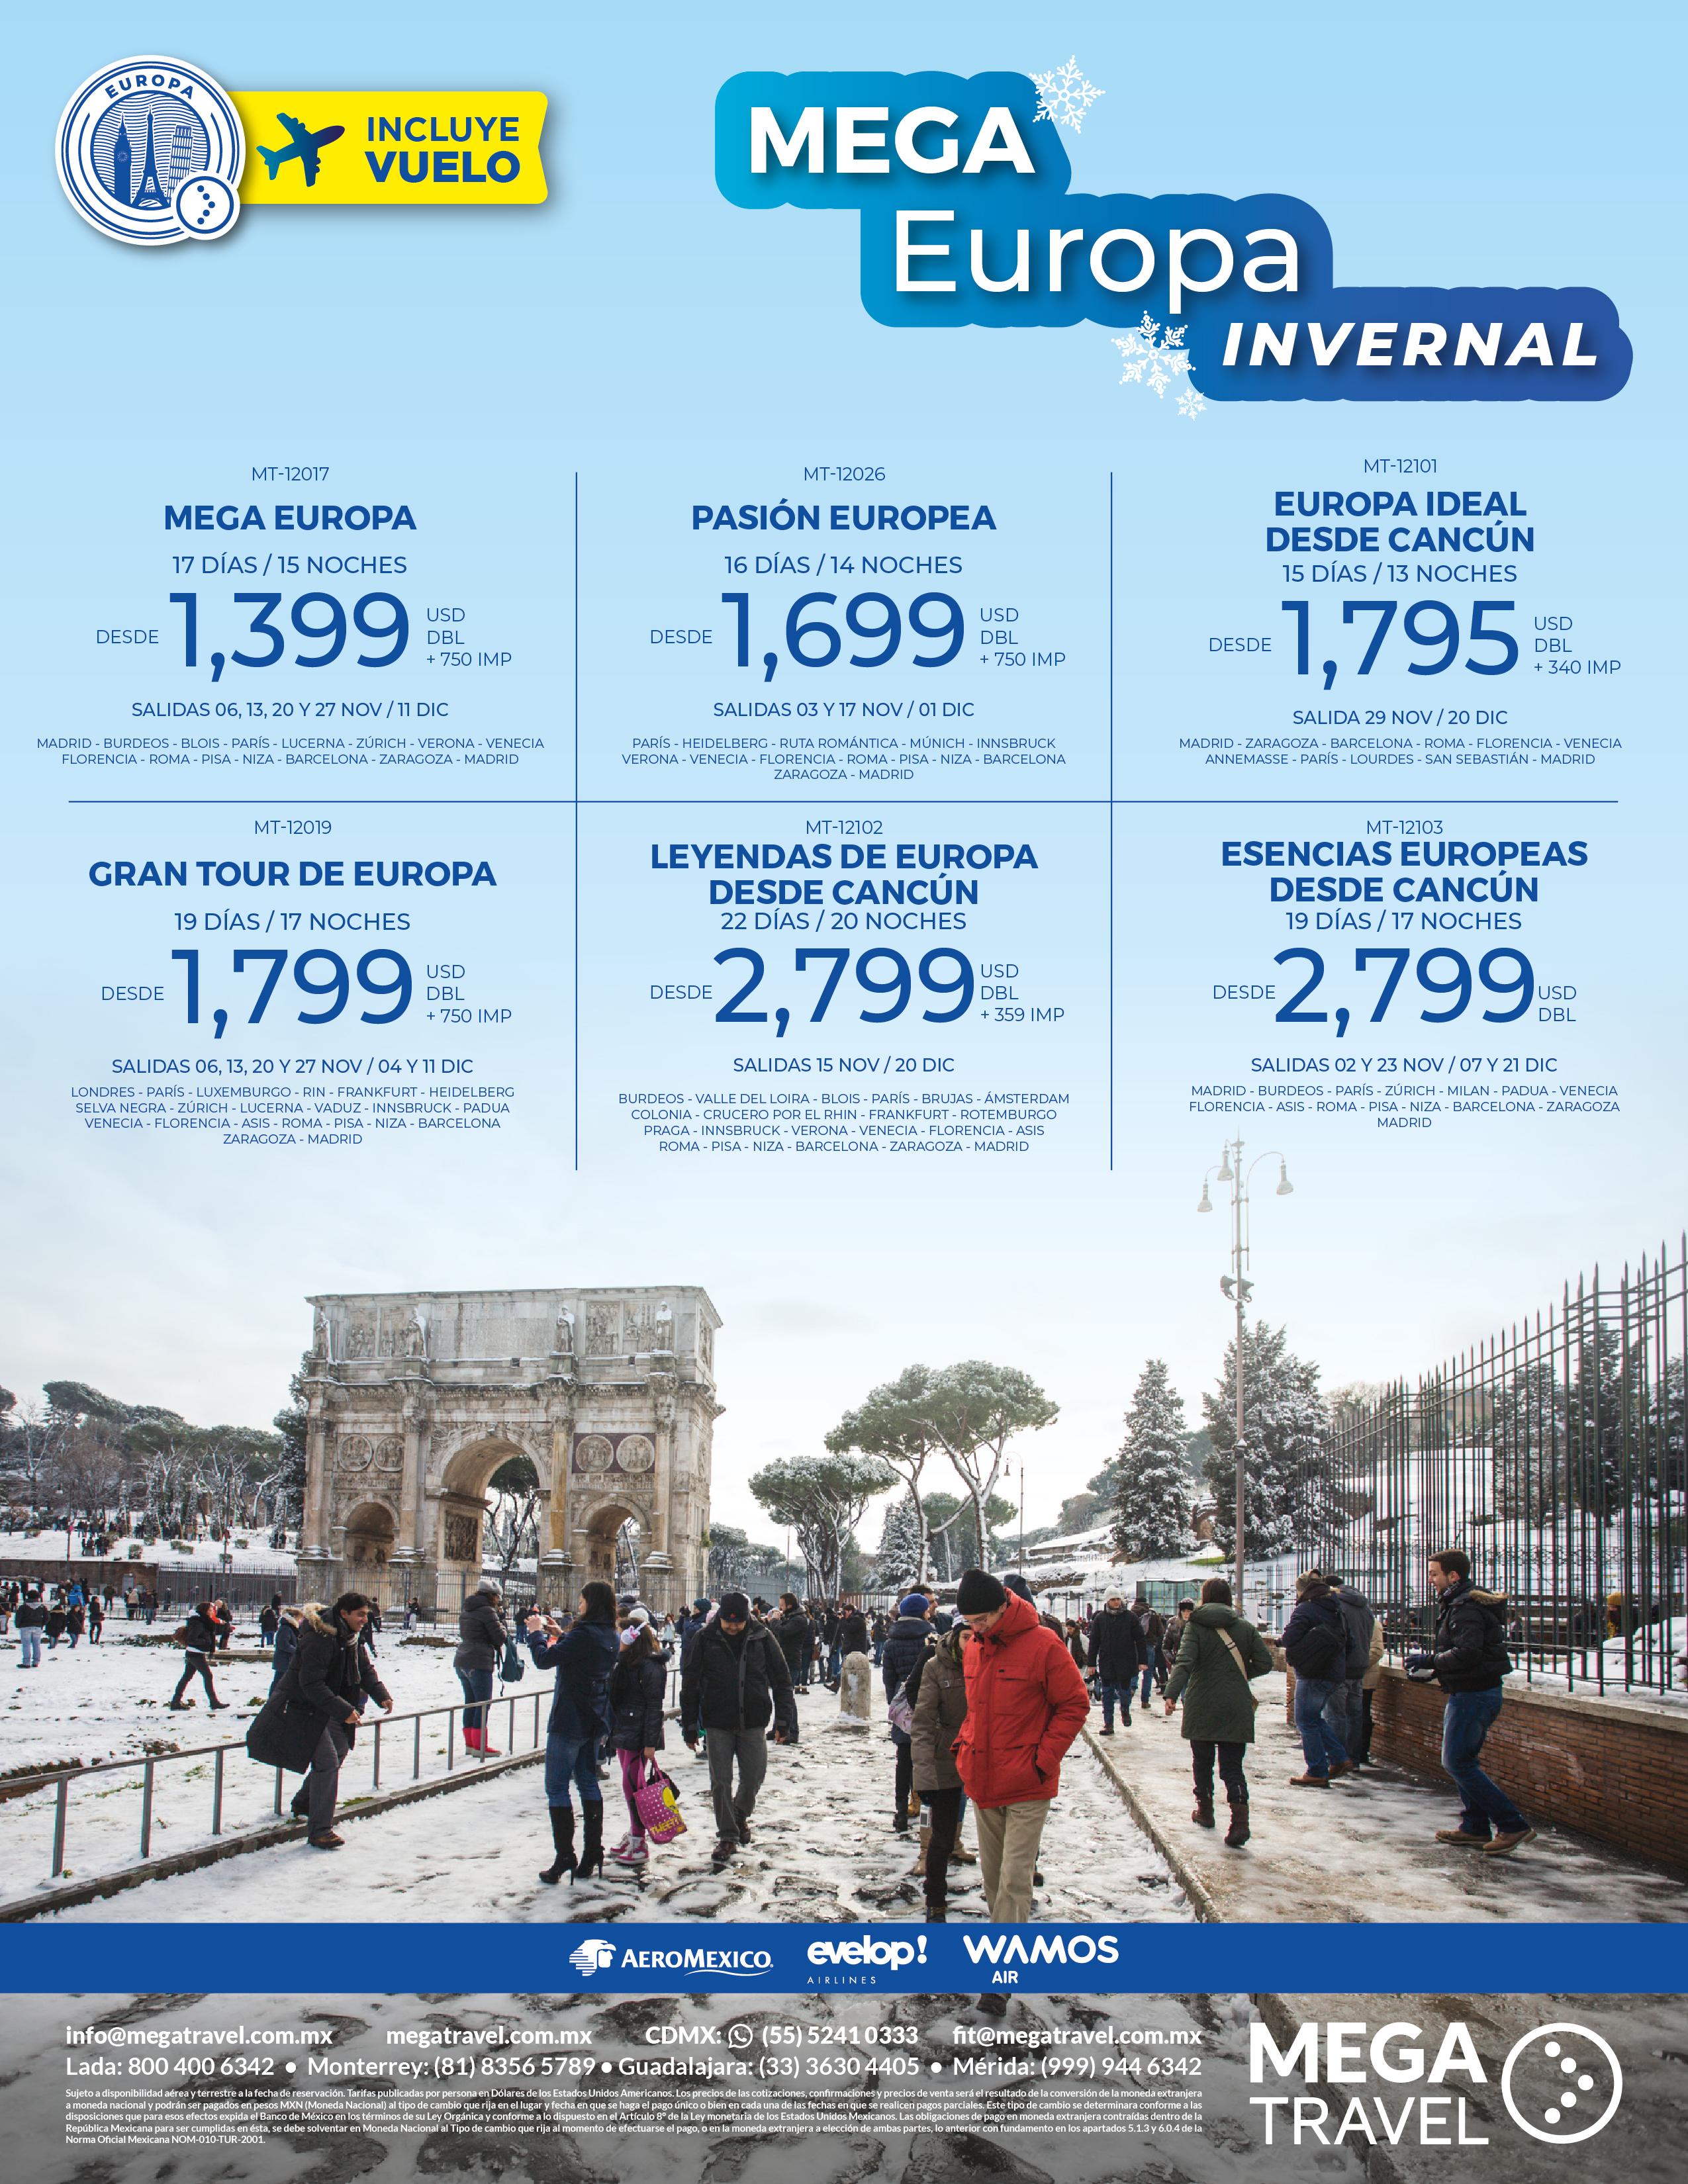 https://0201.nccdn.net/4_2/000/000/008/486/15_Mega-Europa-Invernal.jpg